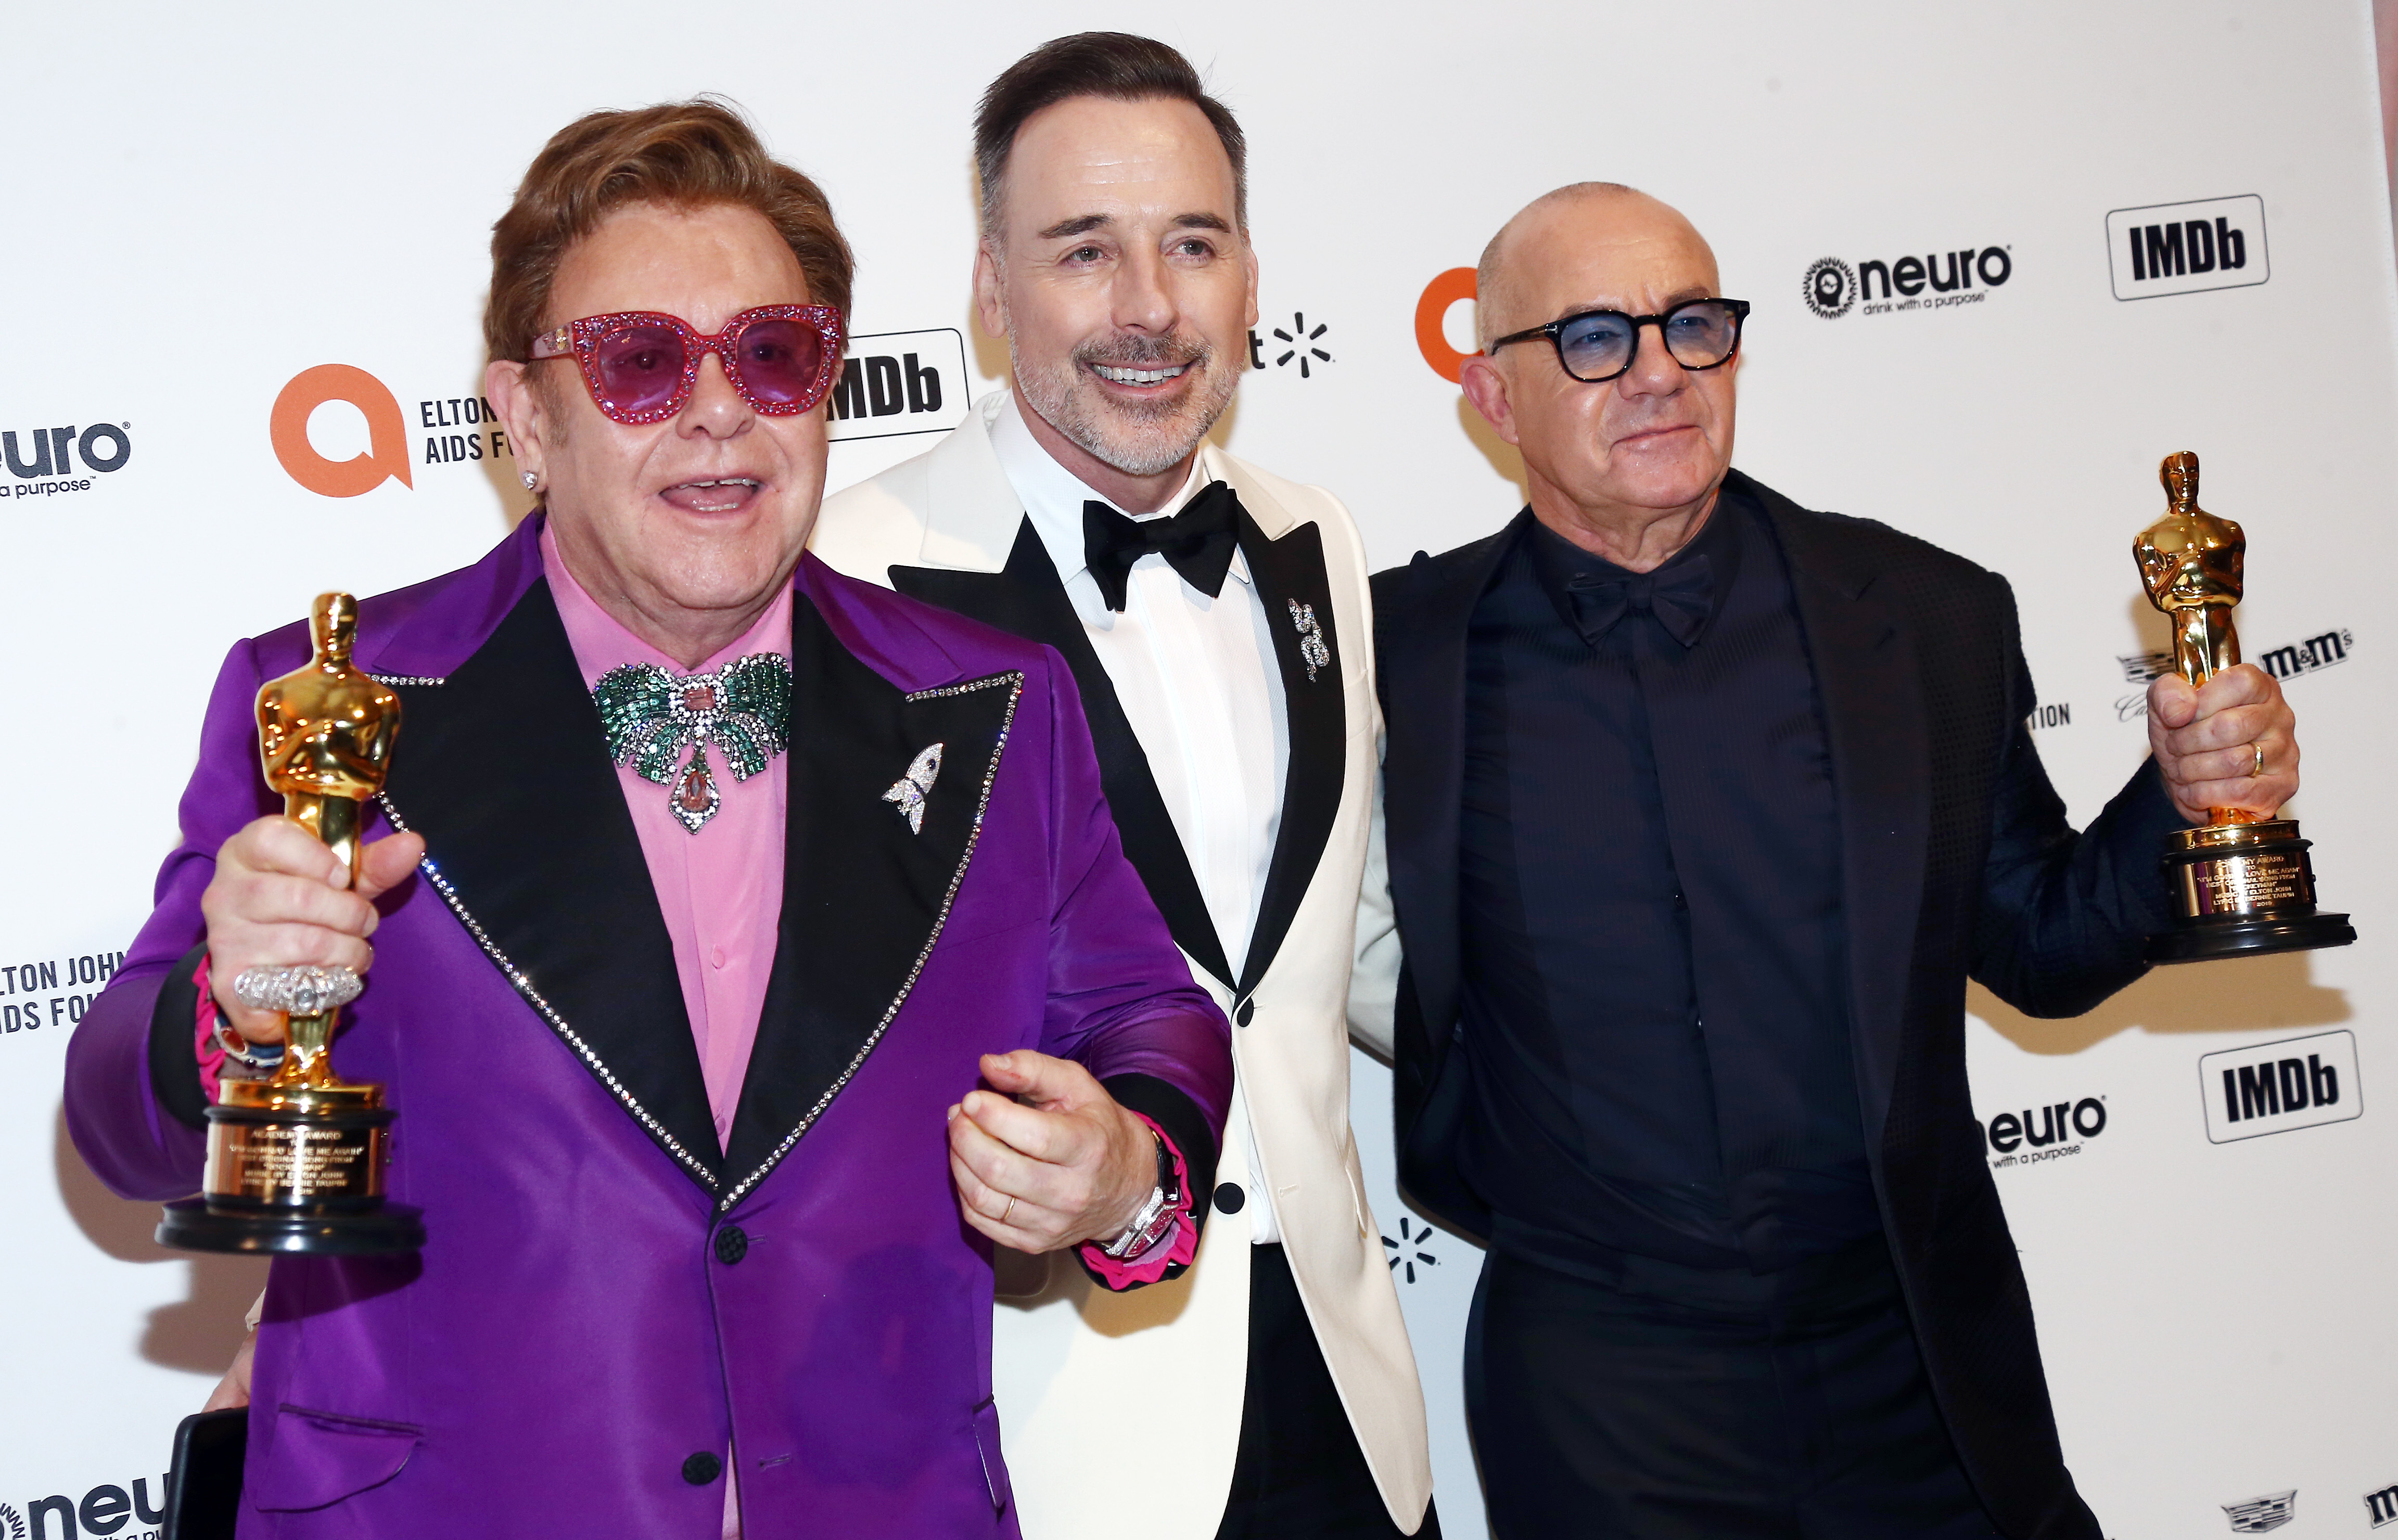 Elton John, Bernie Taupin, and David Furnish